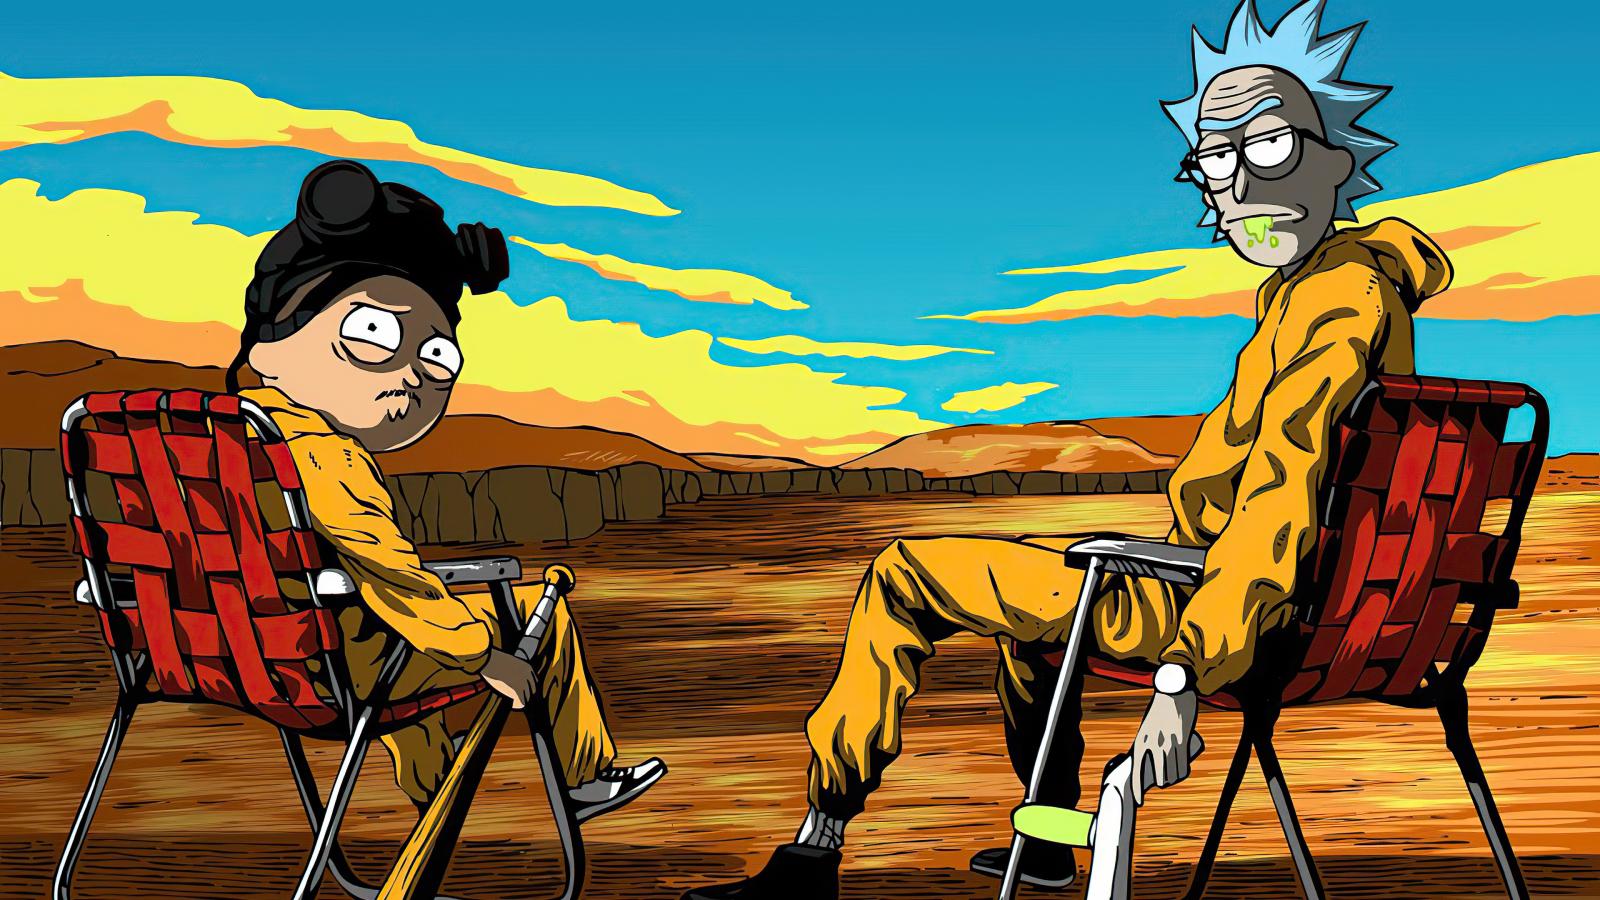 1600x900 Rick & Morty X Breaking Bad 1600x900 Resolution ...